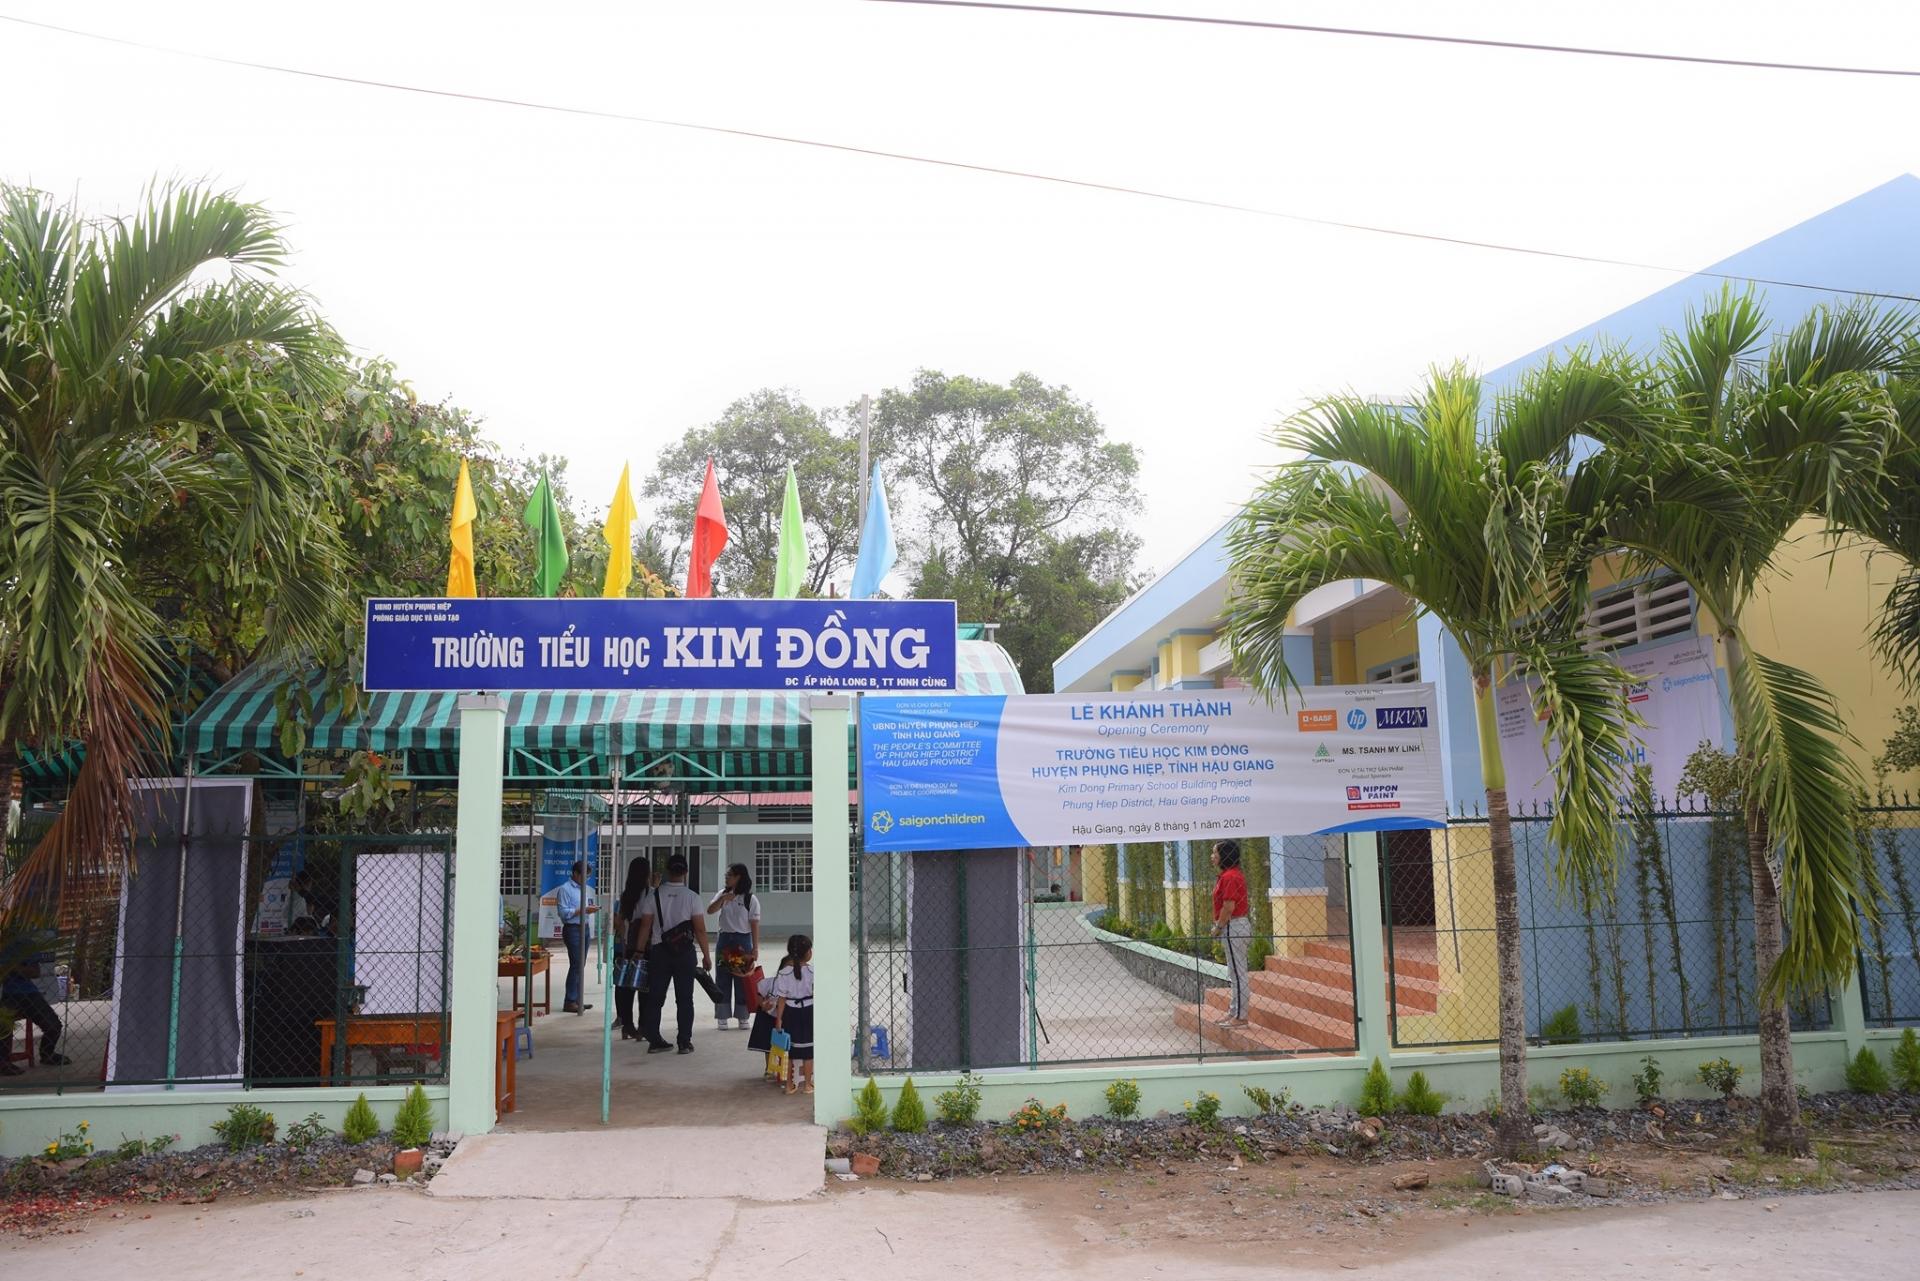 Saigonchildren builds another school in Hau Giang